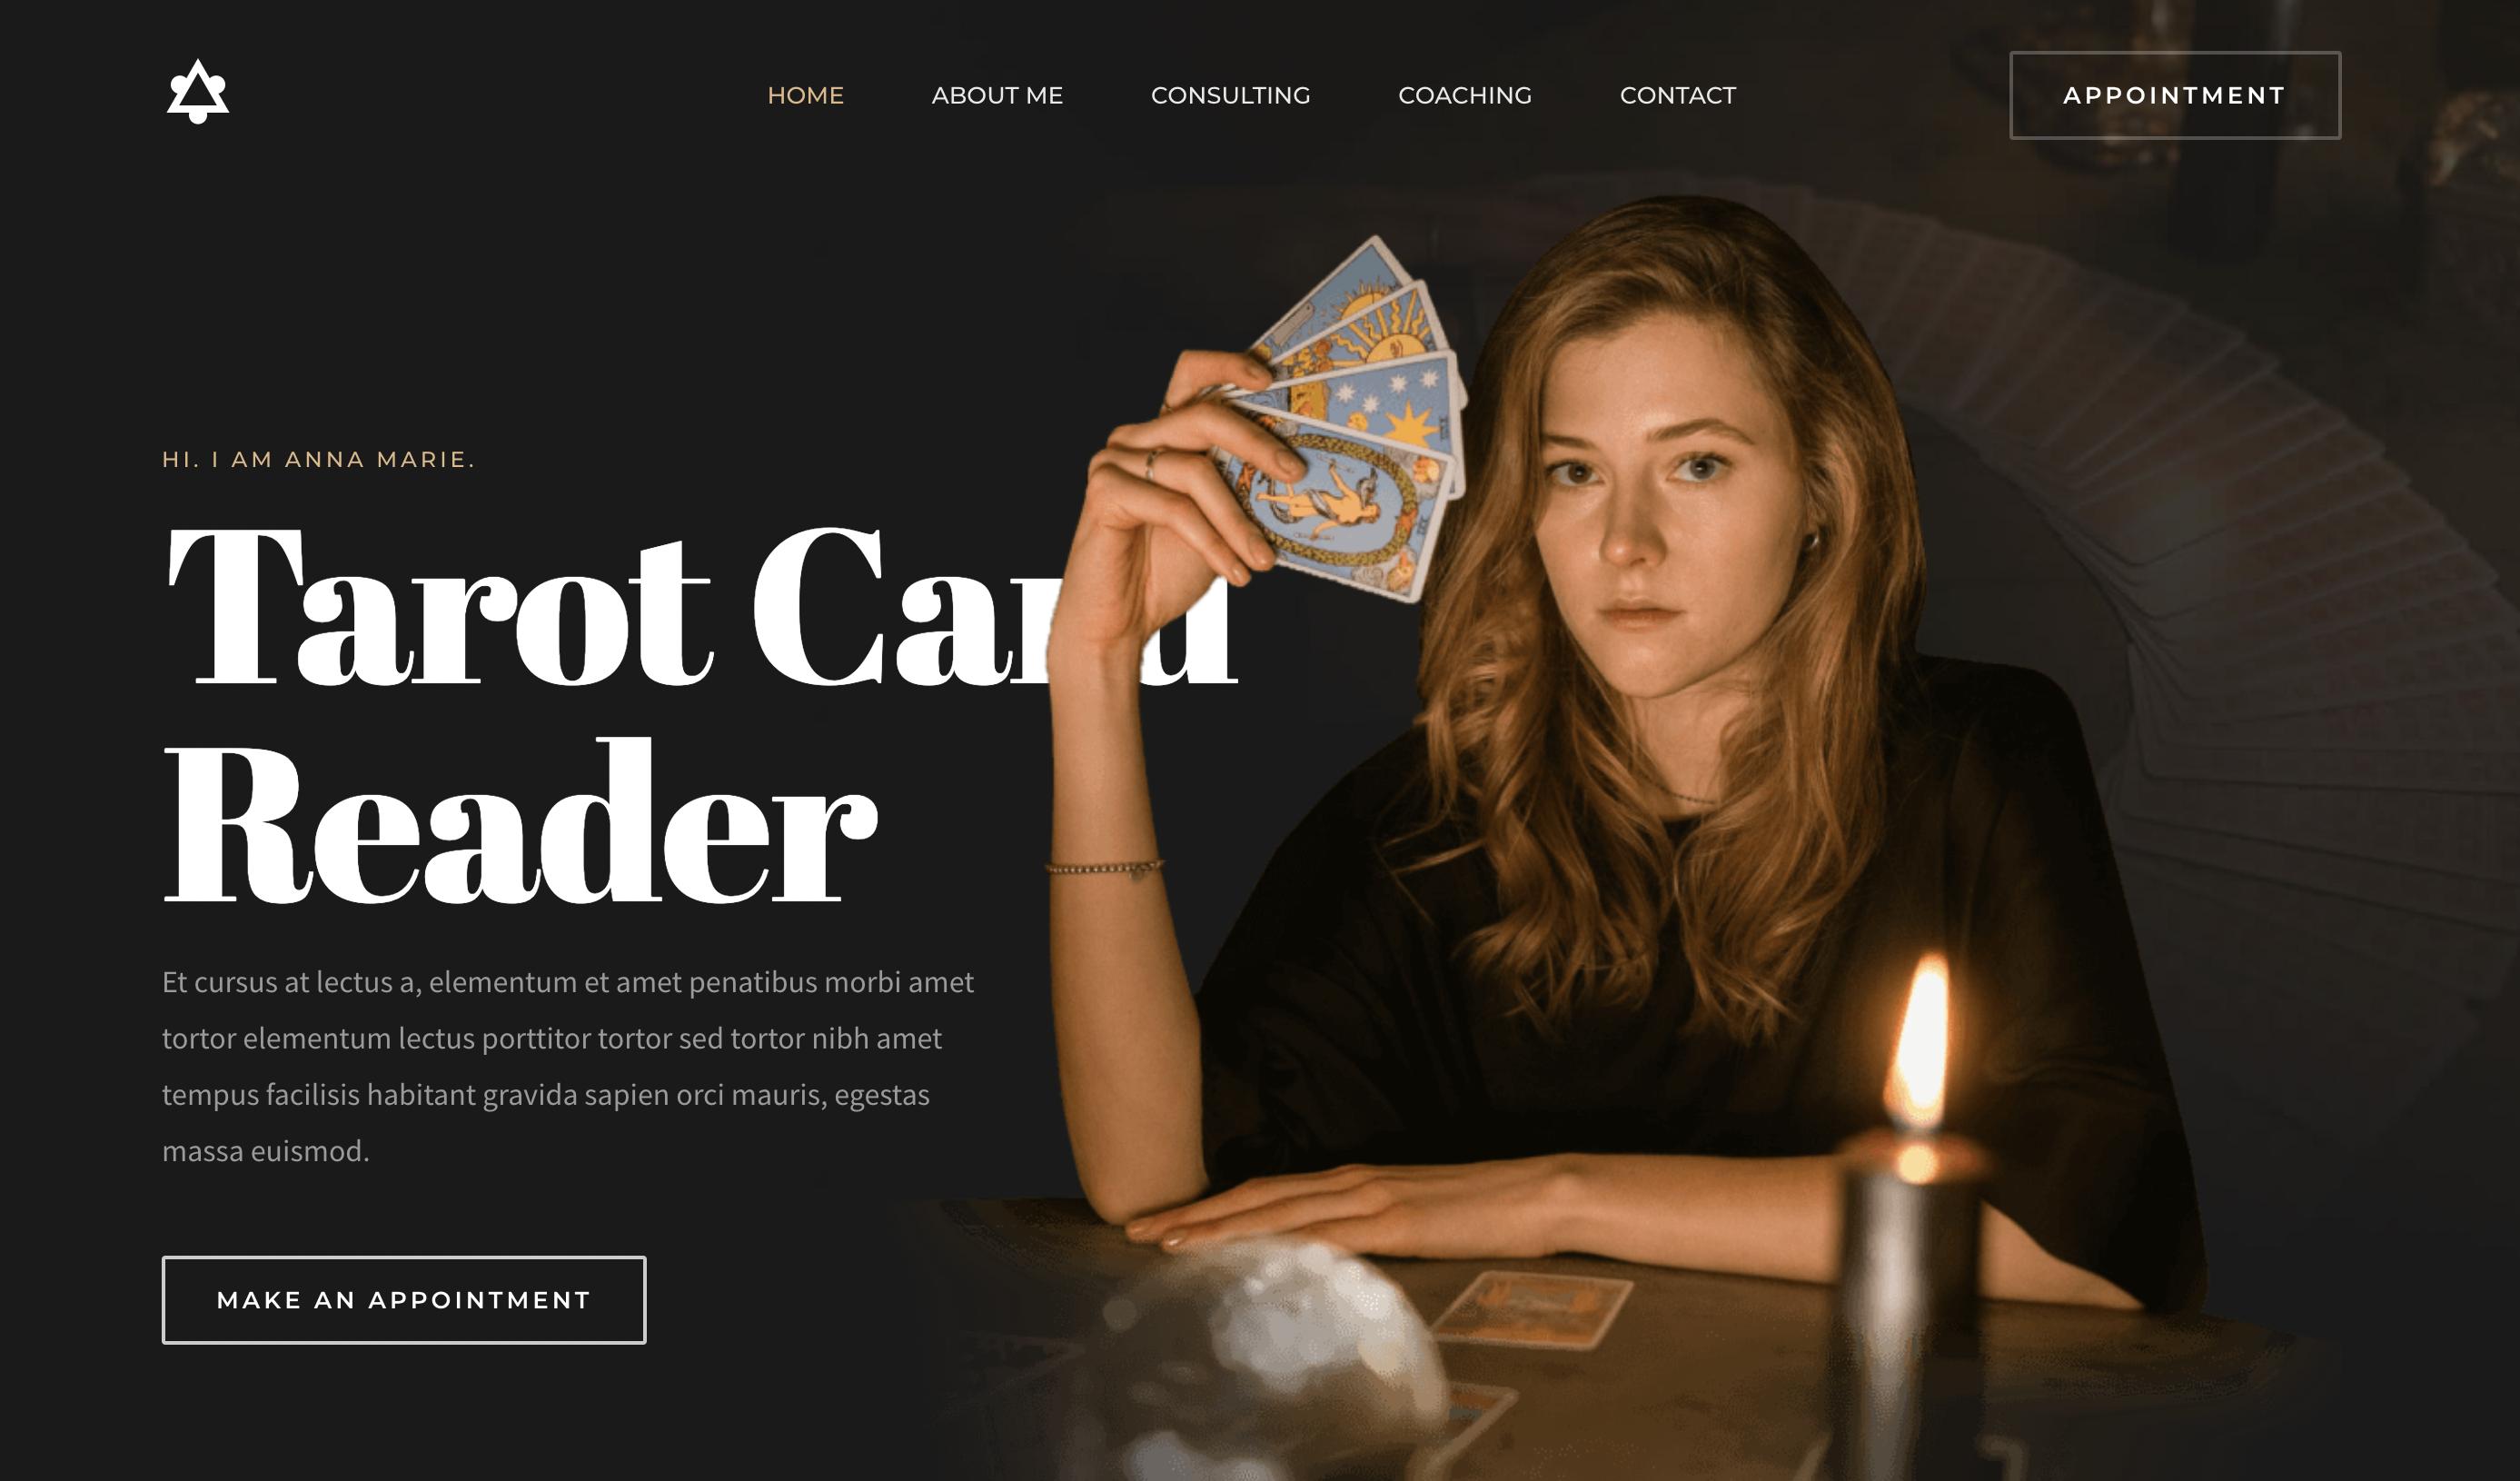 Tarot Card Reader Template